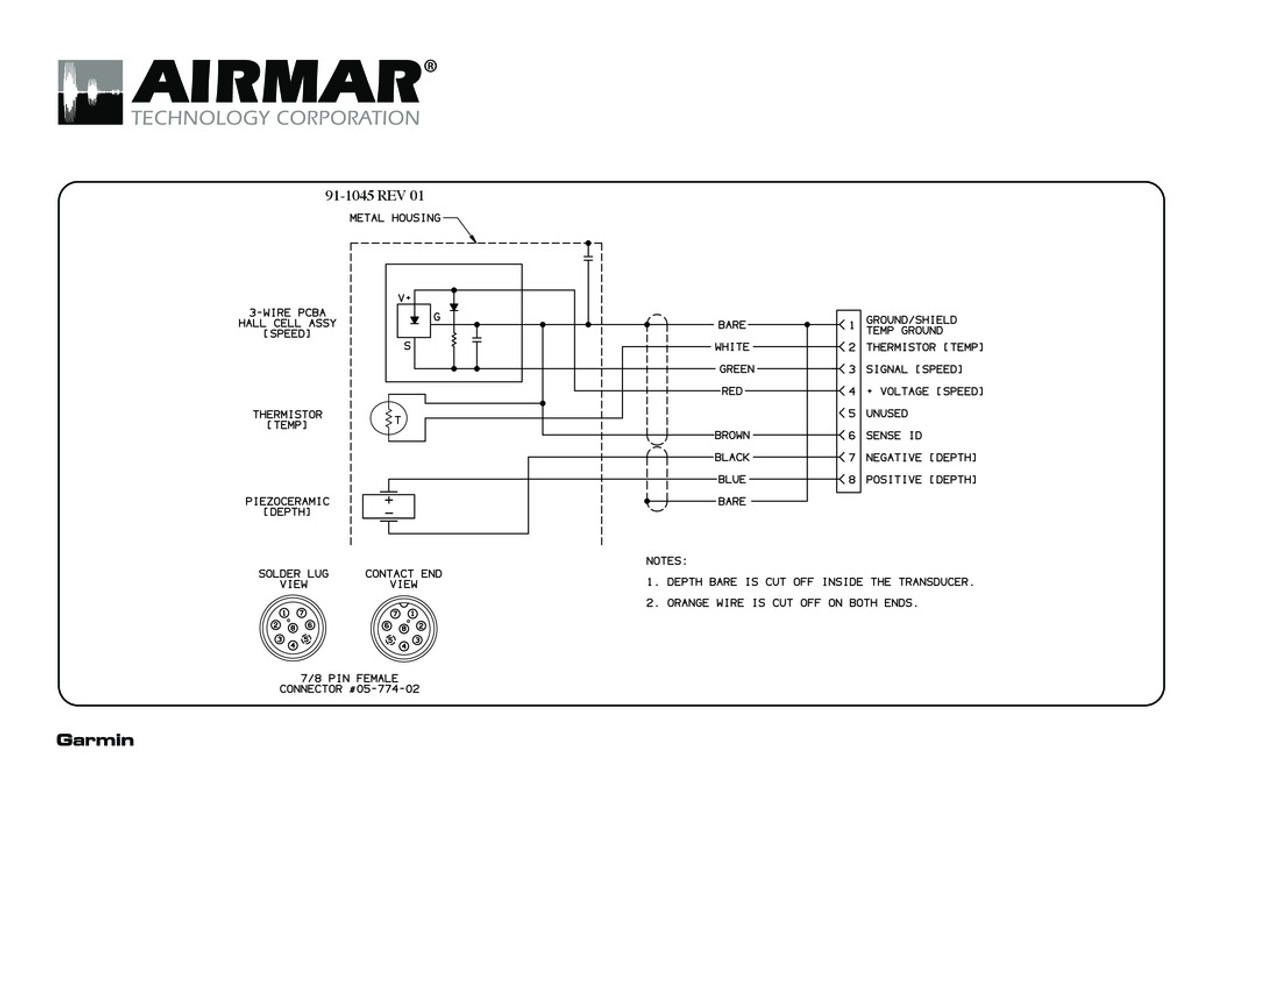 diagram for wiring 8 pin nr 51 use wiring diagram diagram for wiring 8 pin nr [ 1280 x 989 Pixel ]